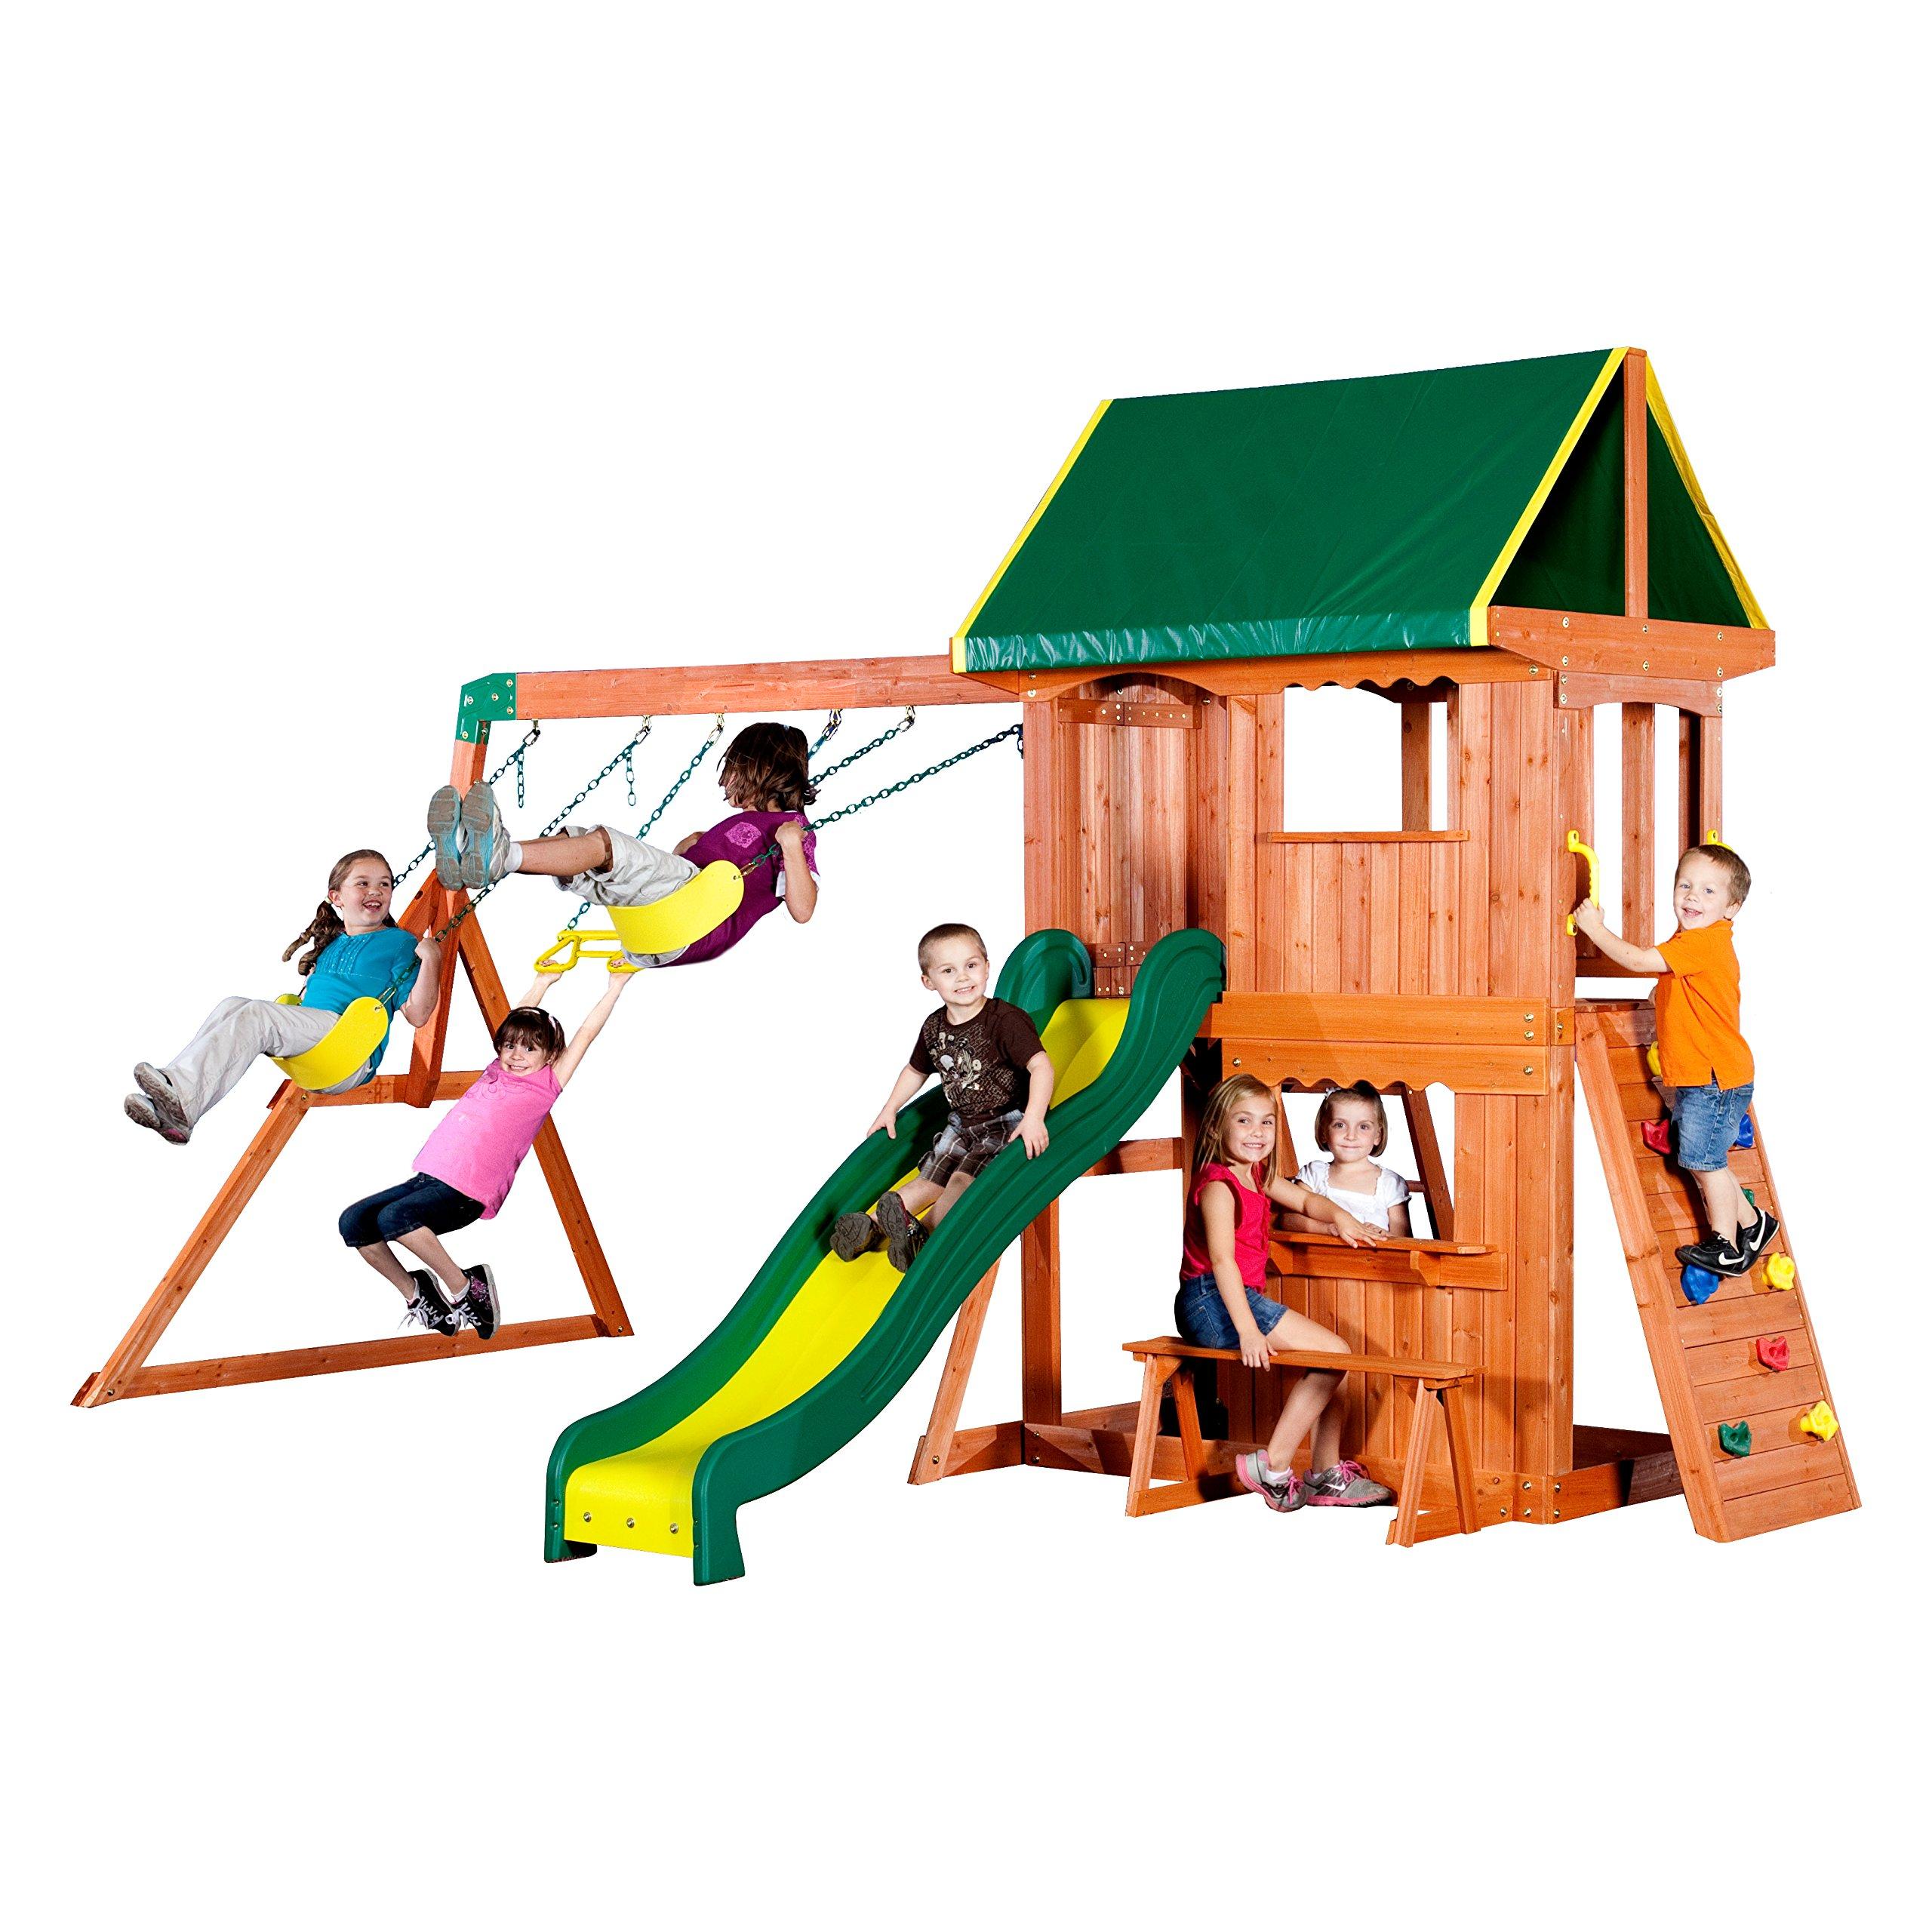 Backyard Discovery Somerset All Cedar Wood Playset Swing Set by Backyard Discovery